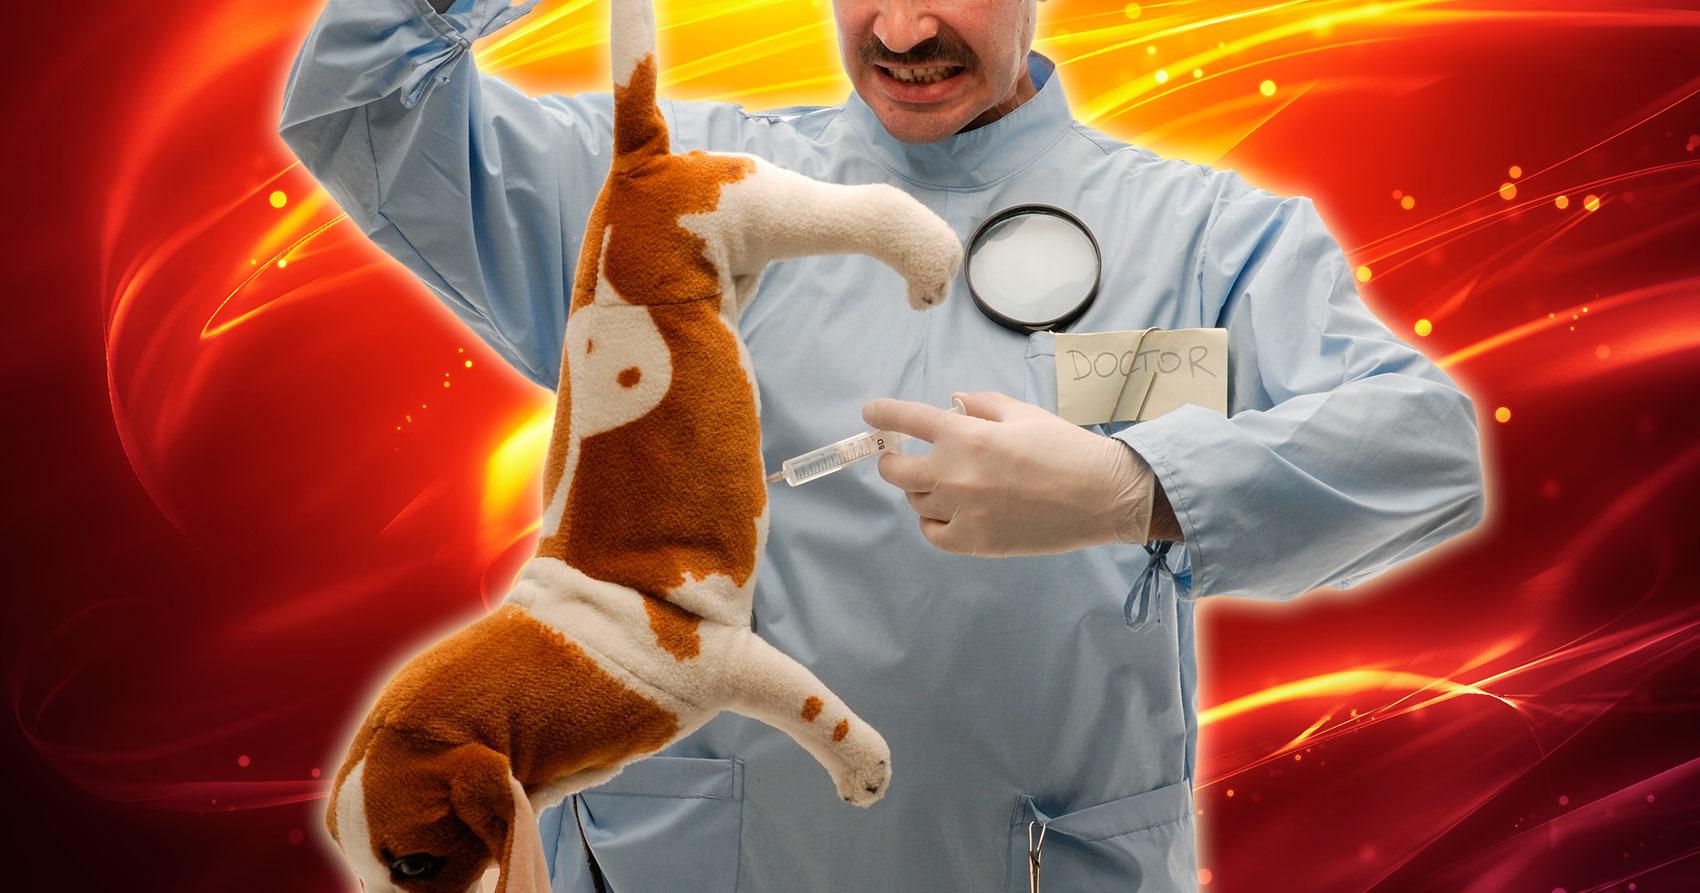 Vacunación Irresponsable en mascotas